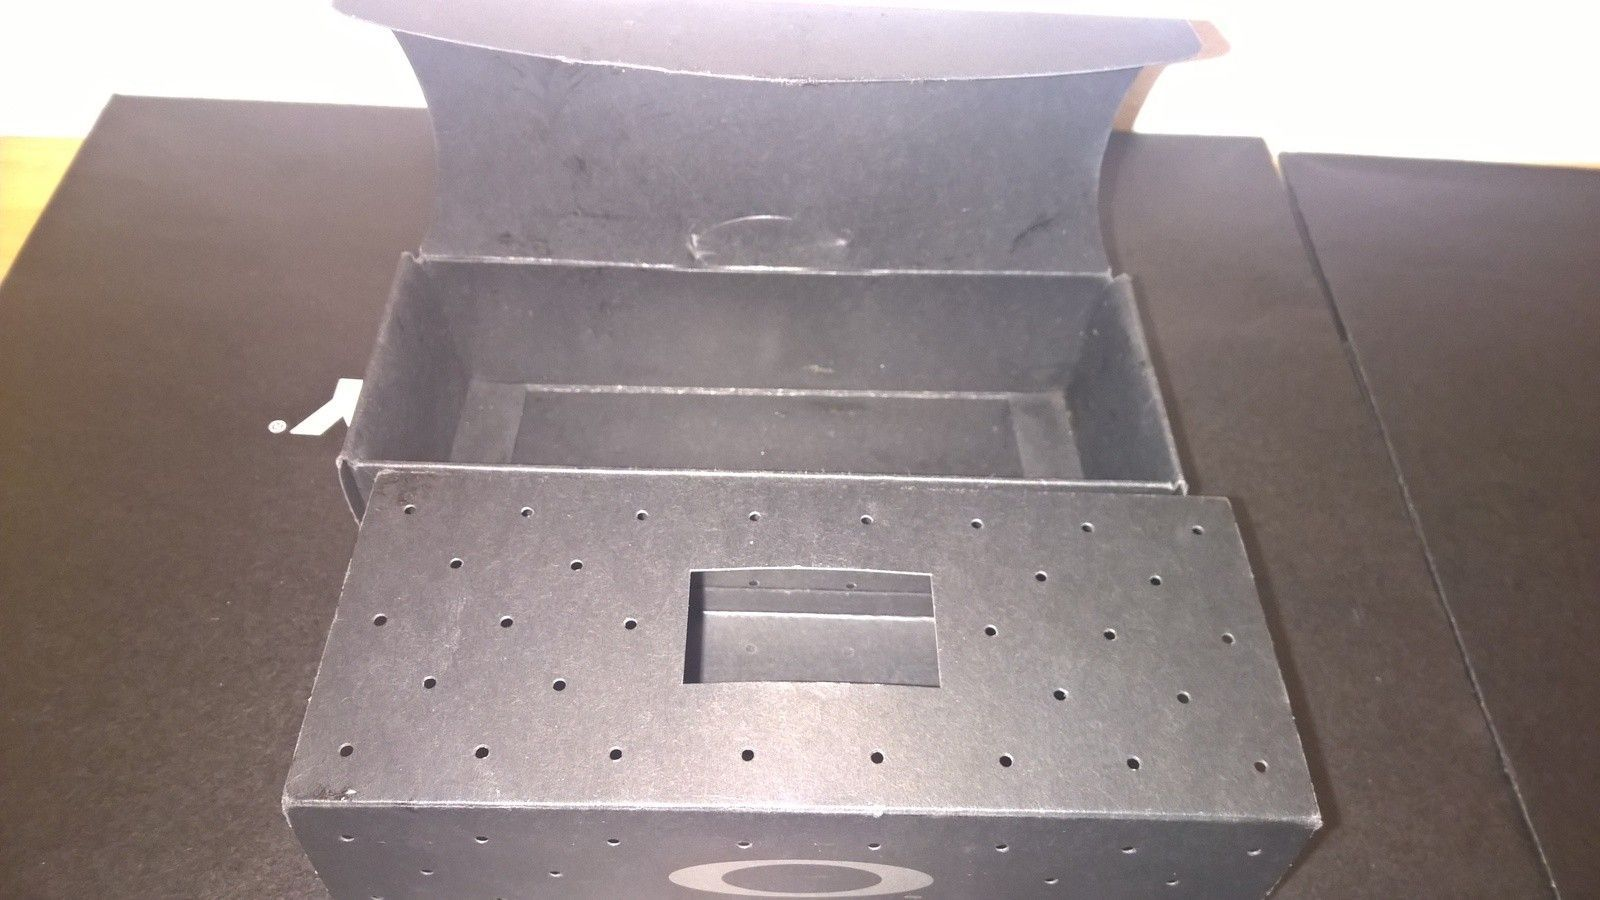 Romeo 1 Gold Iridium Lenses / Box / Rubbers - WP_20150312_01_49_53_Pro.jpg